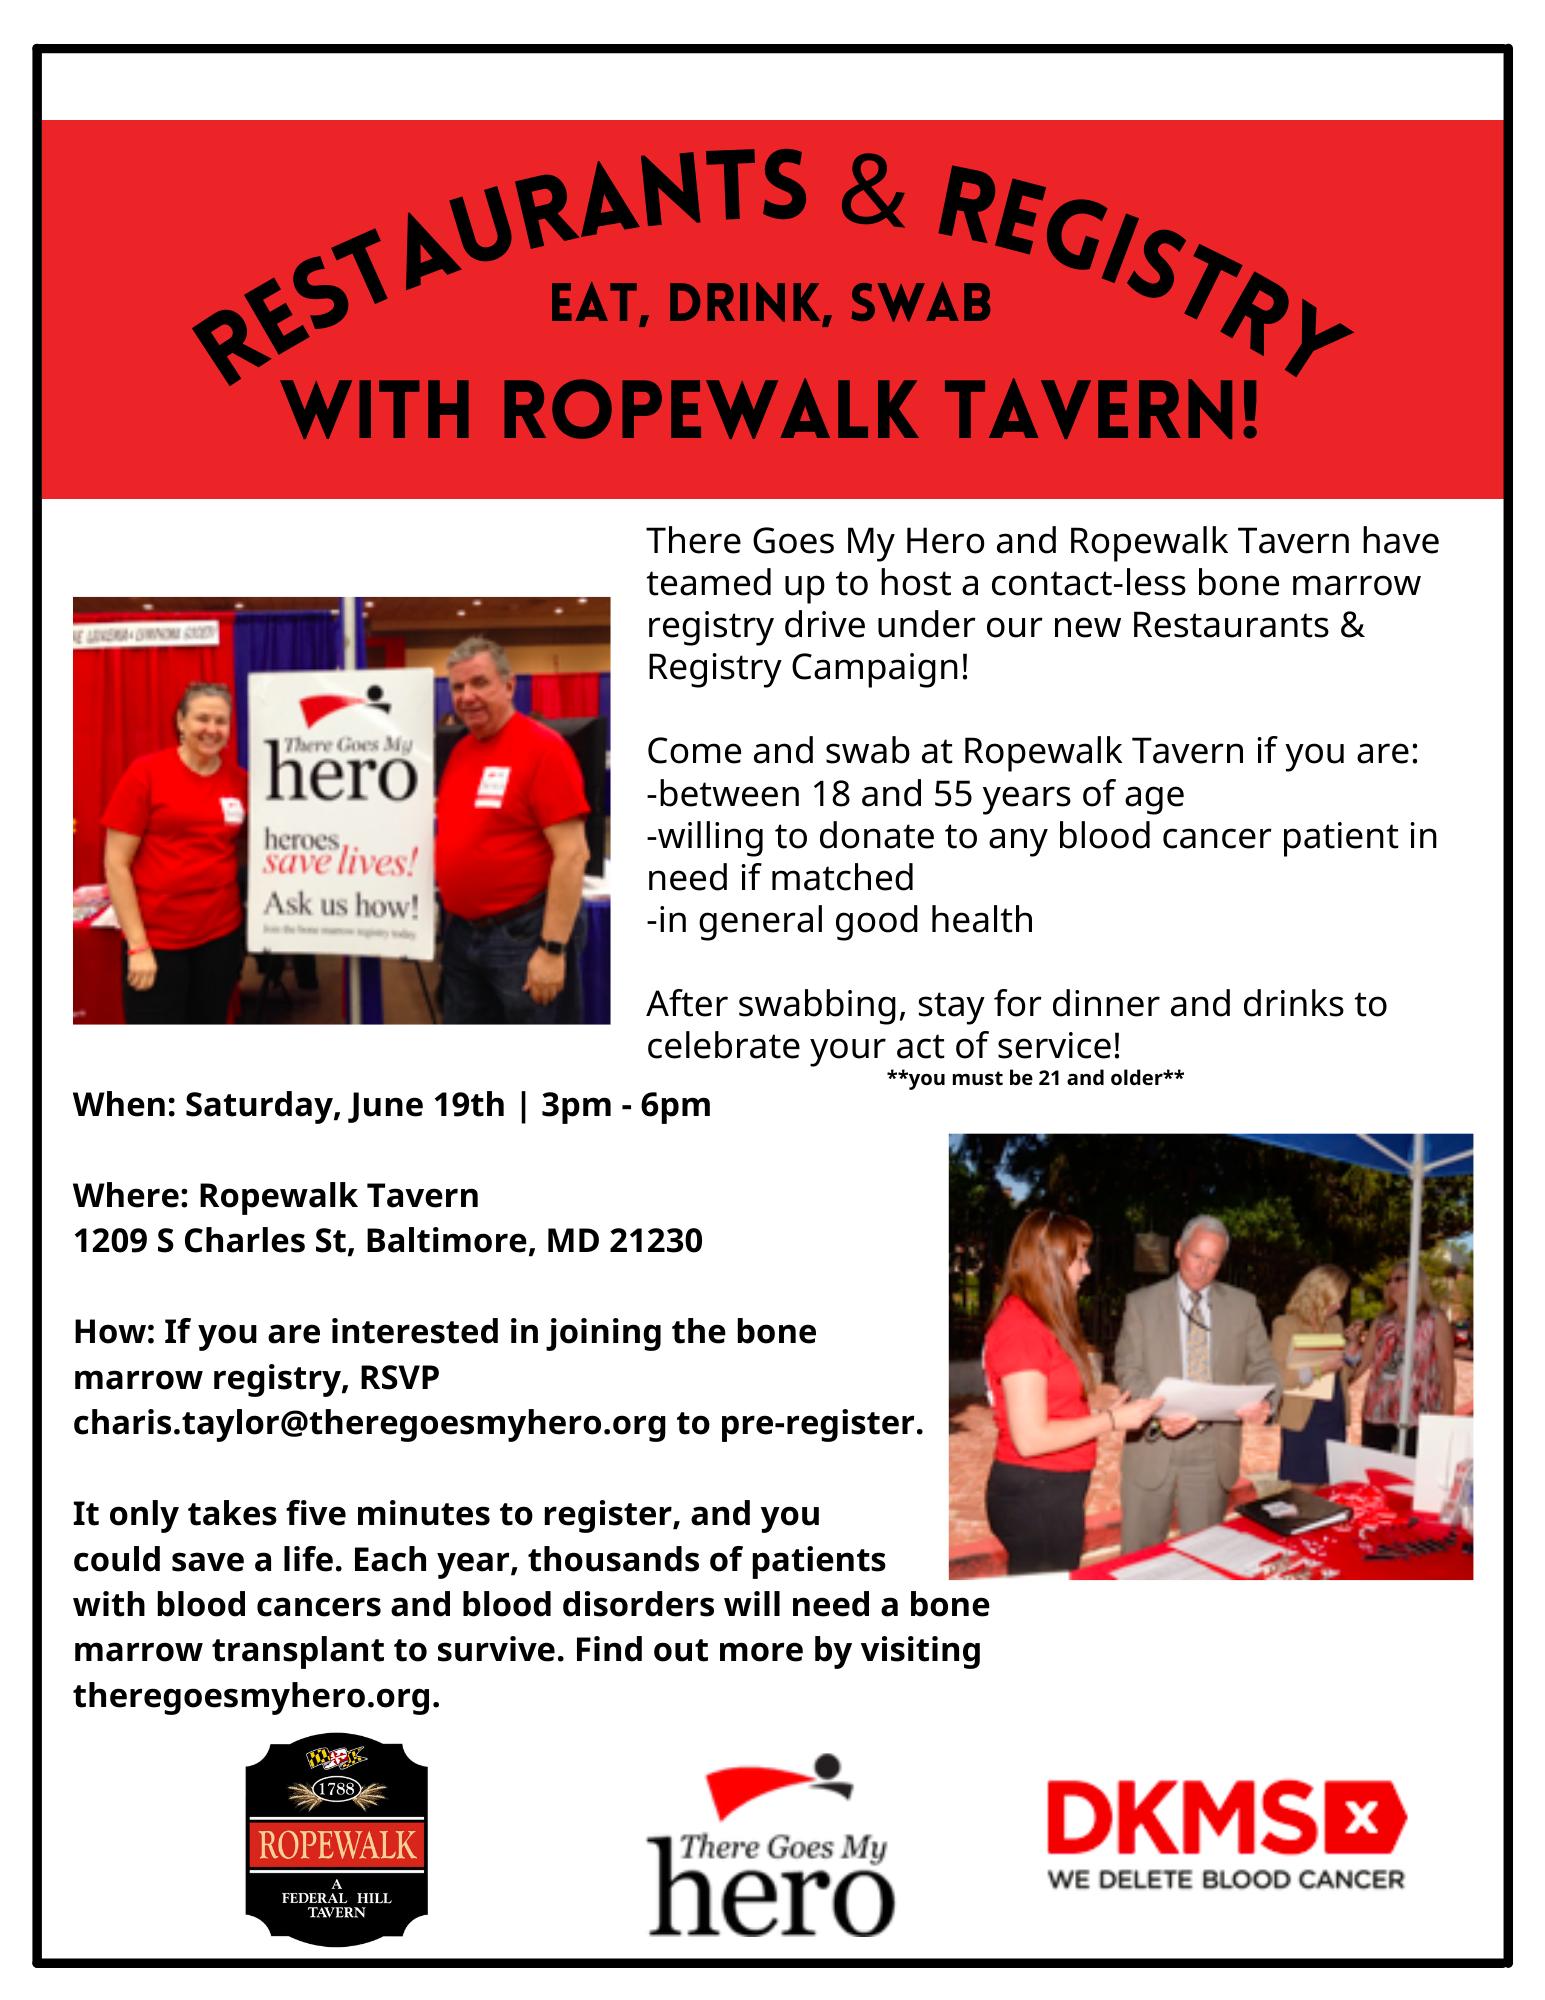 Ropewalk Tavern Bone Marrow Registry Drive